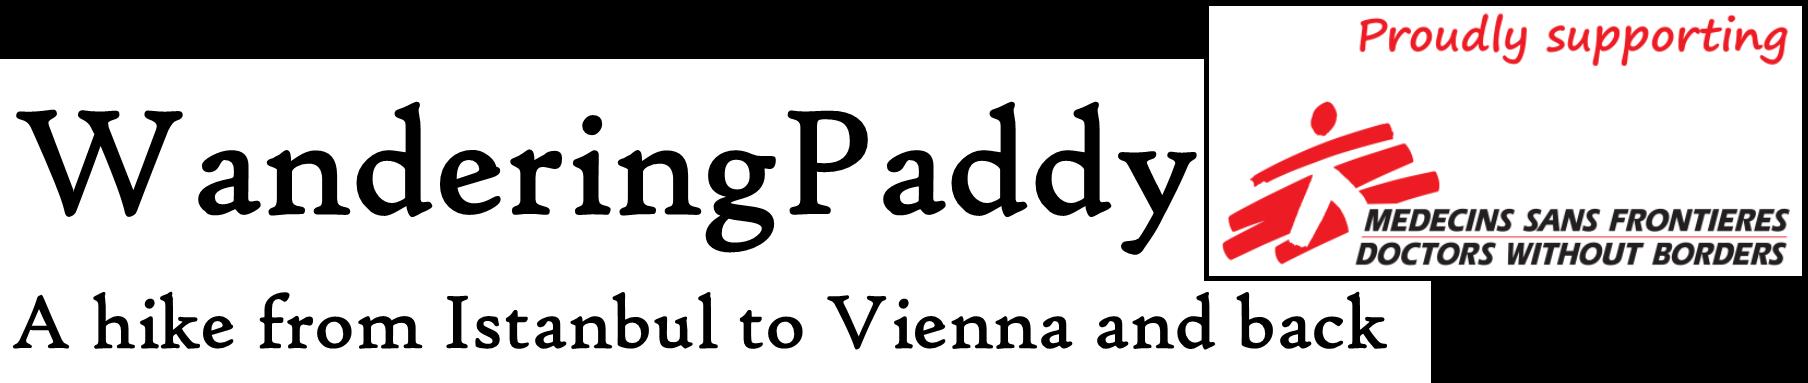 WanderingPaddy